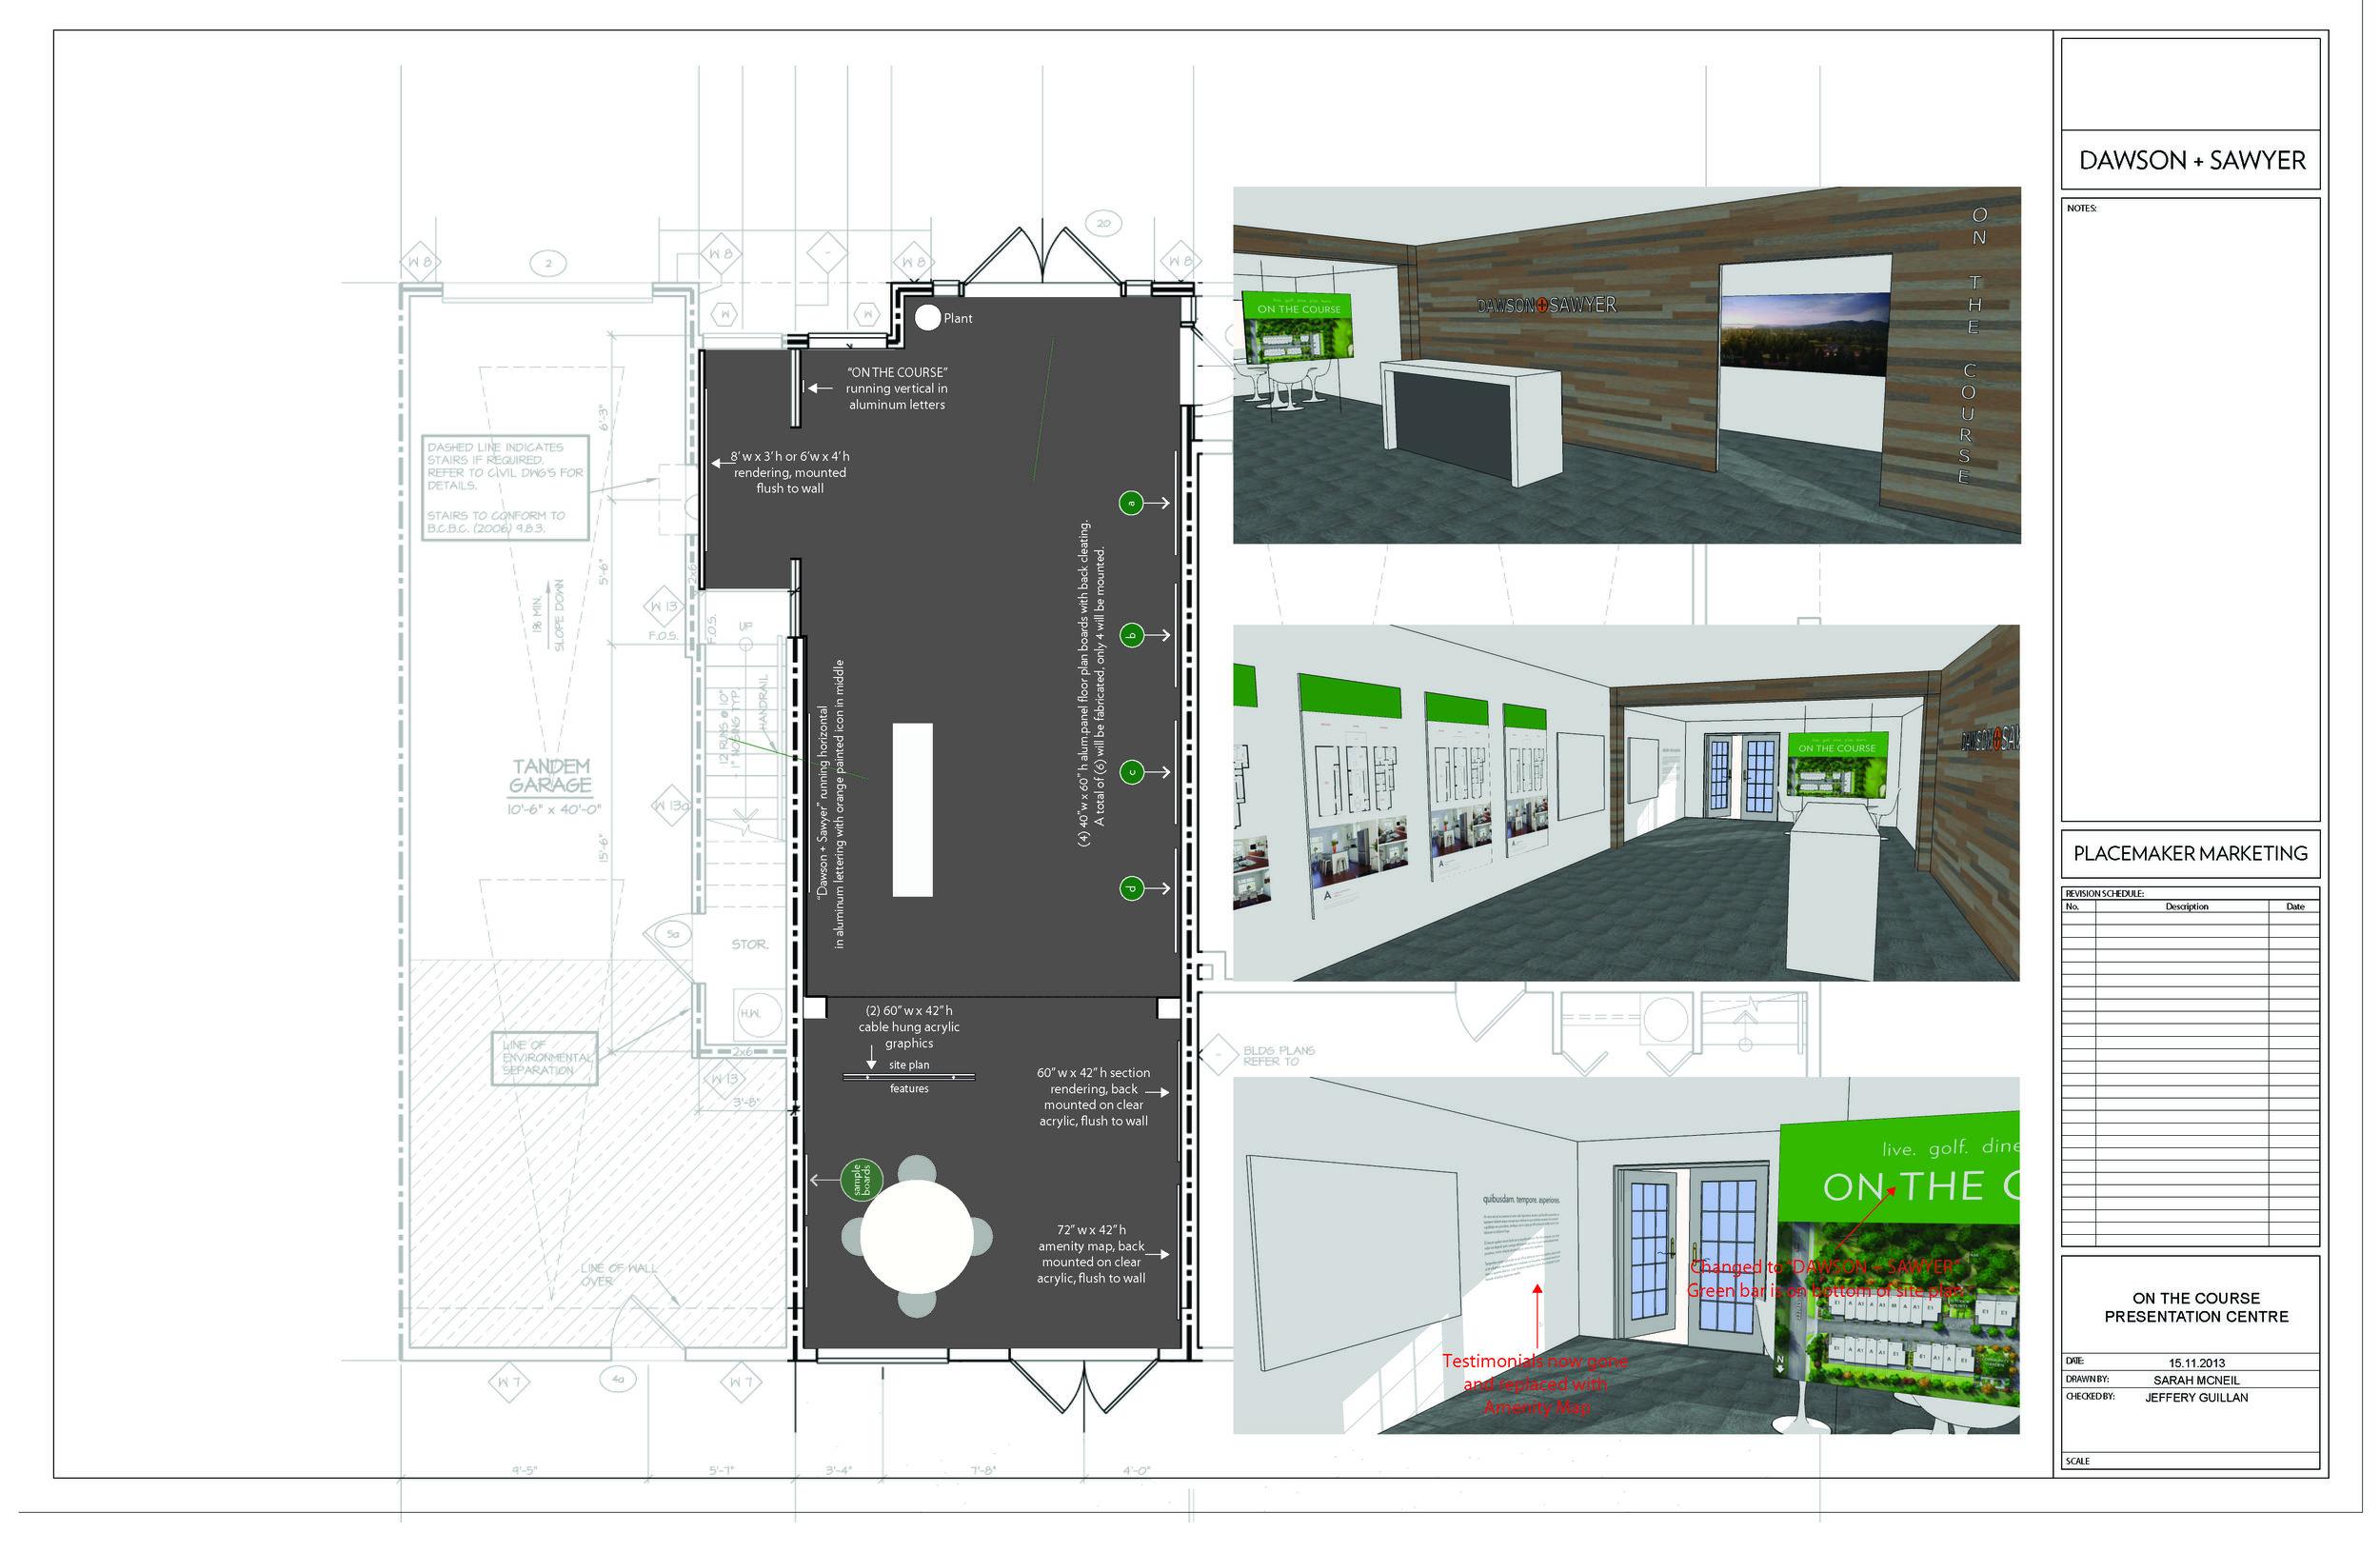 OTC+Sale+Centre+Plan-06.12.2013.jpg